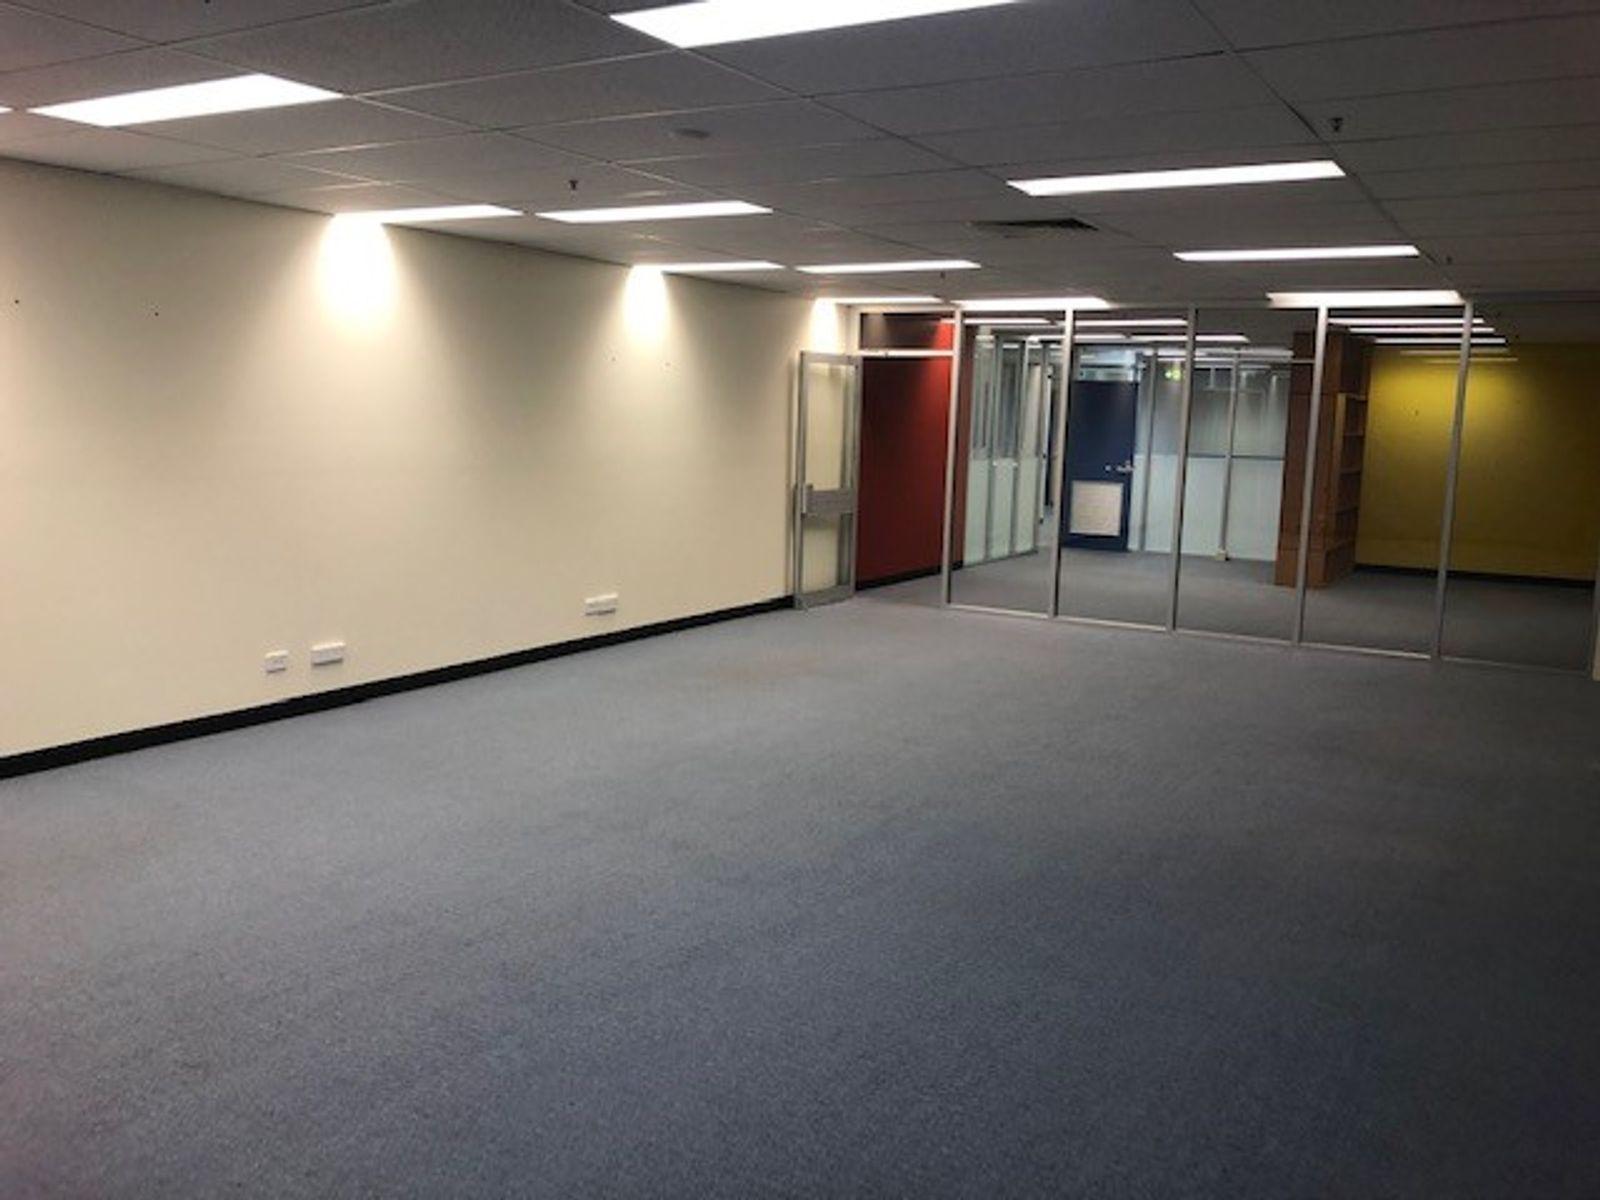 Level 3/25 Cavenagh Street, Darwin City, NT 0800